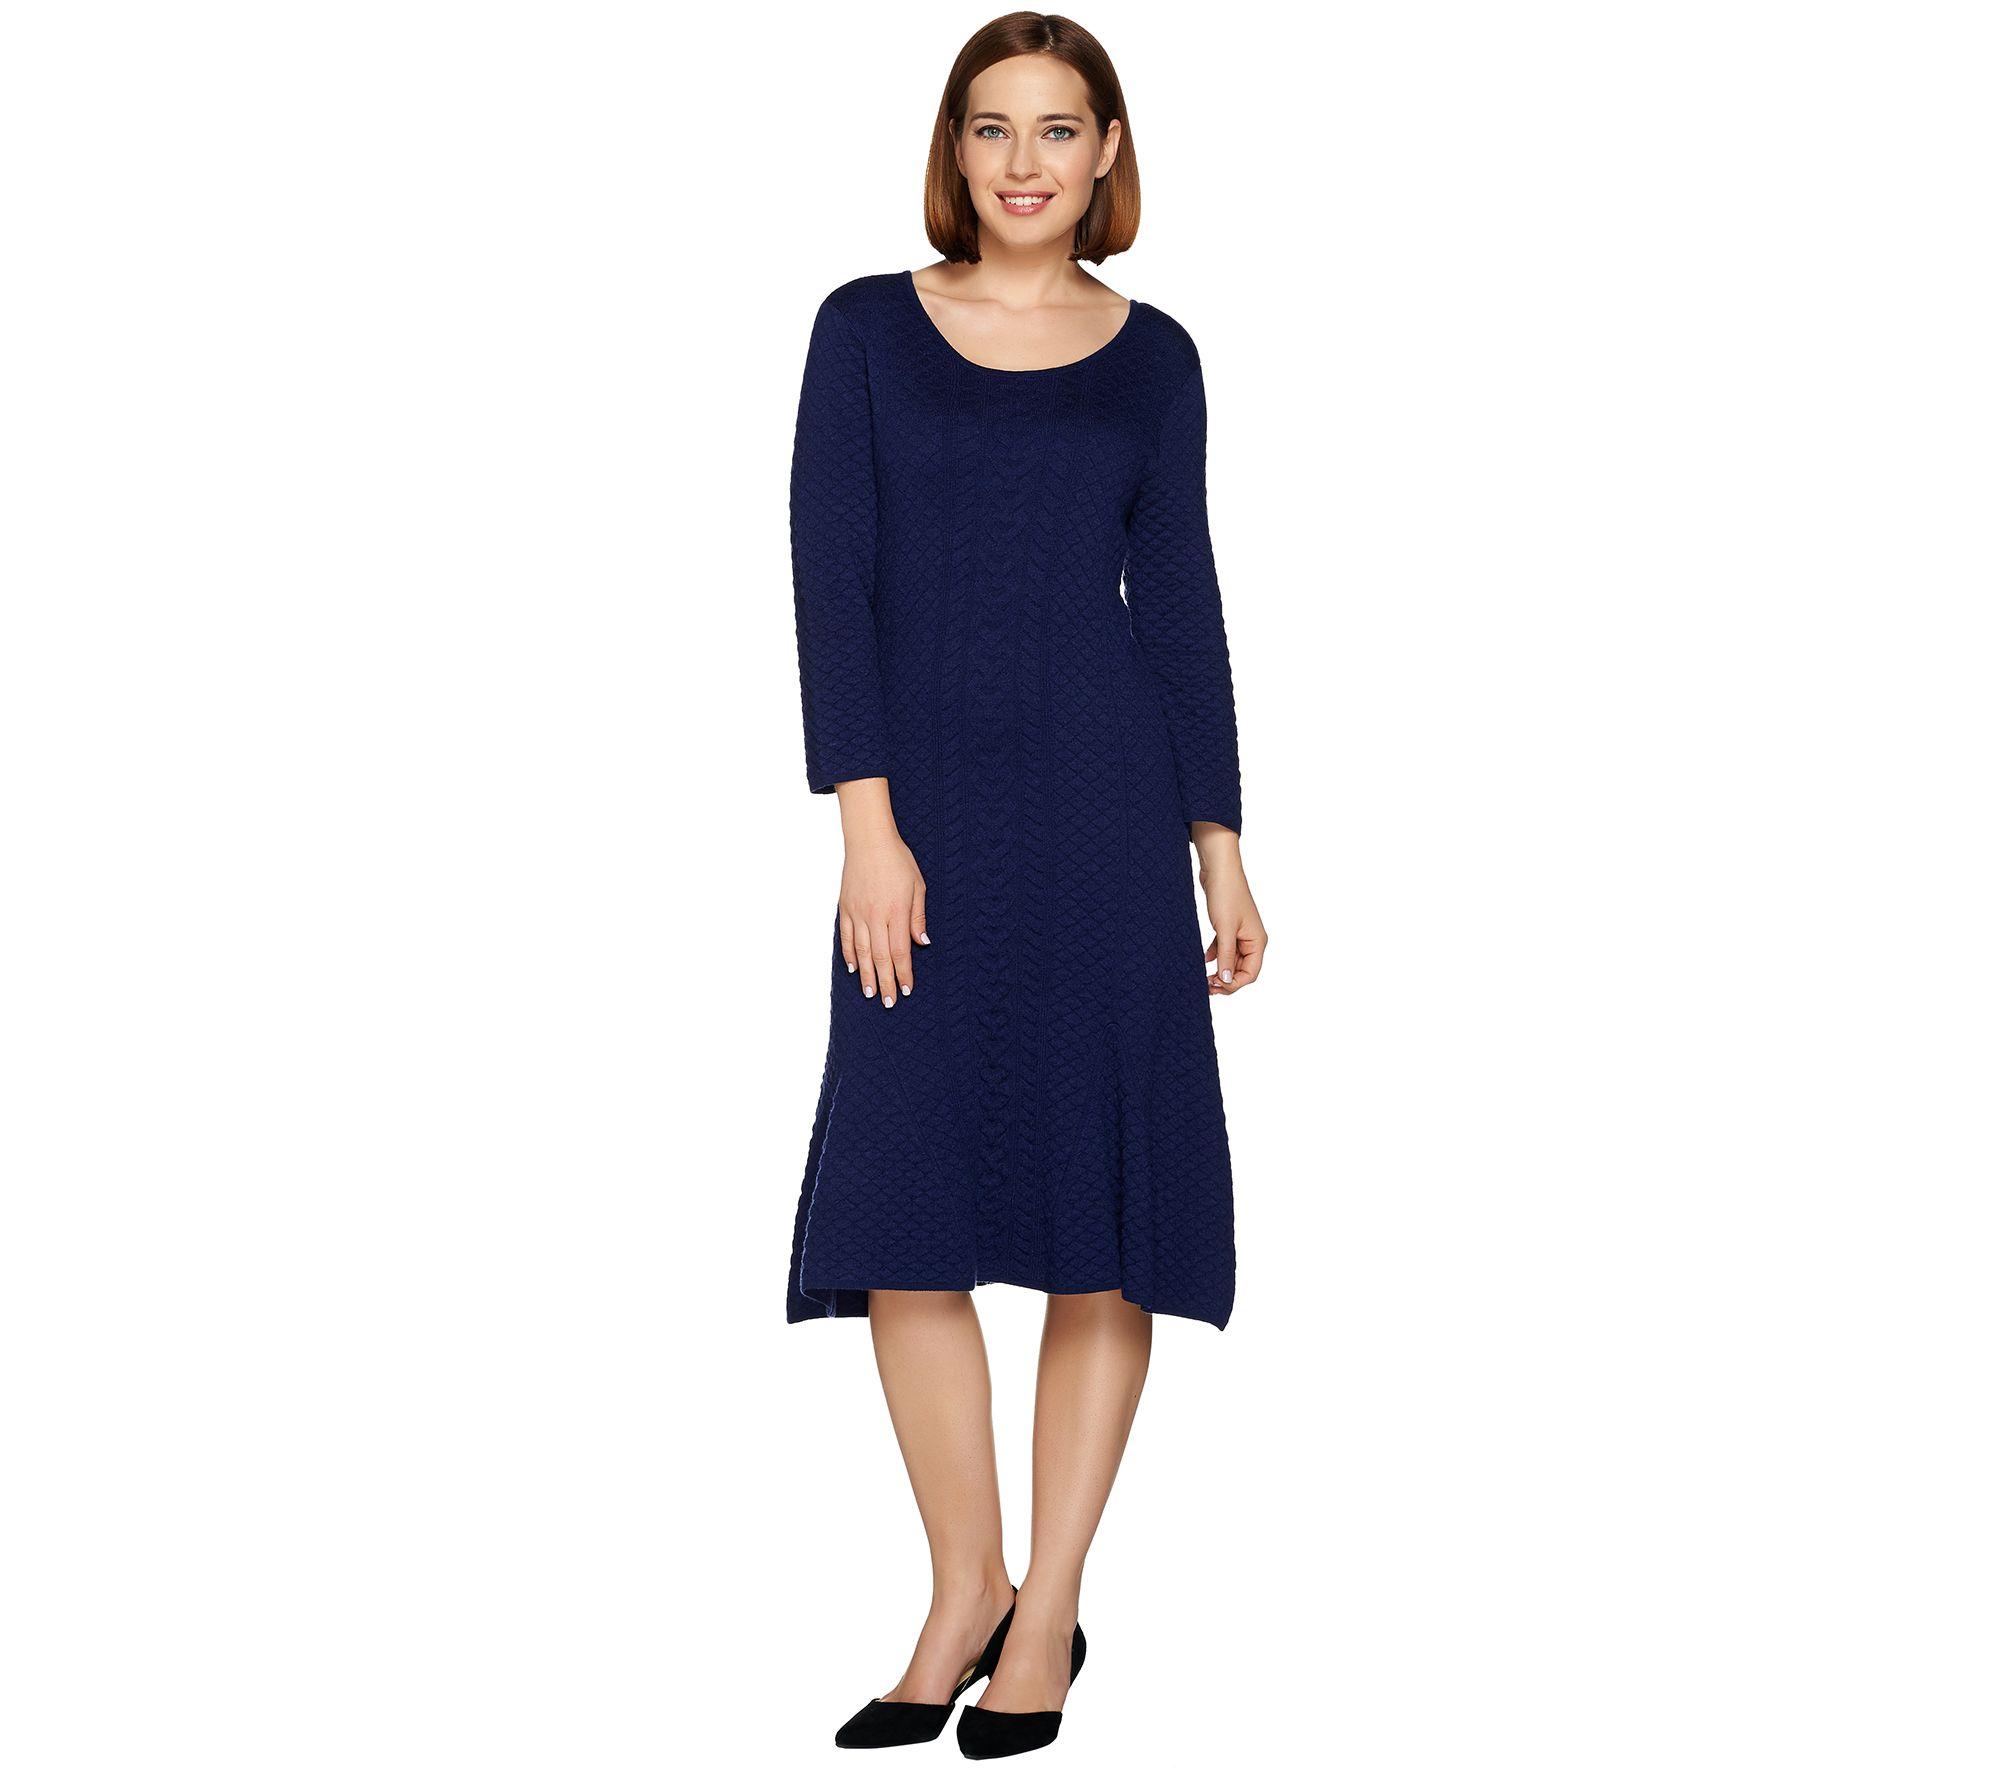 Isaac mizrahi clothes online